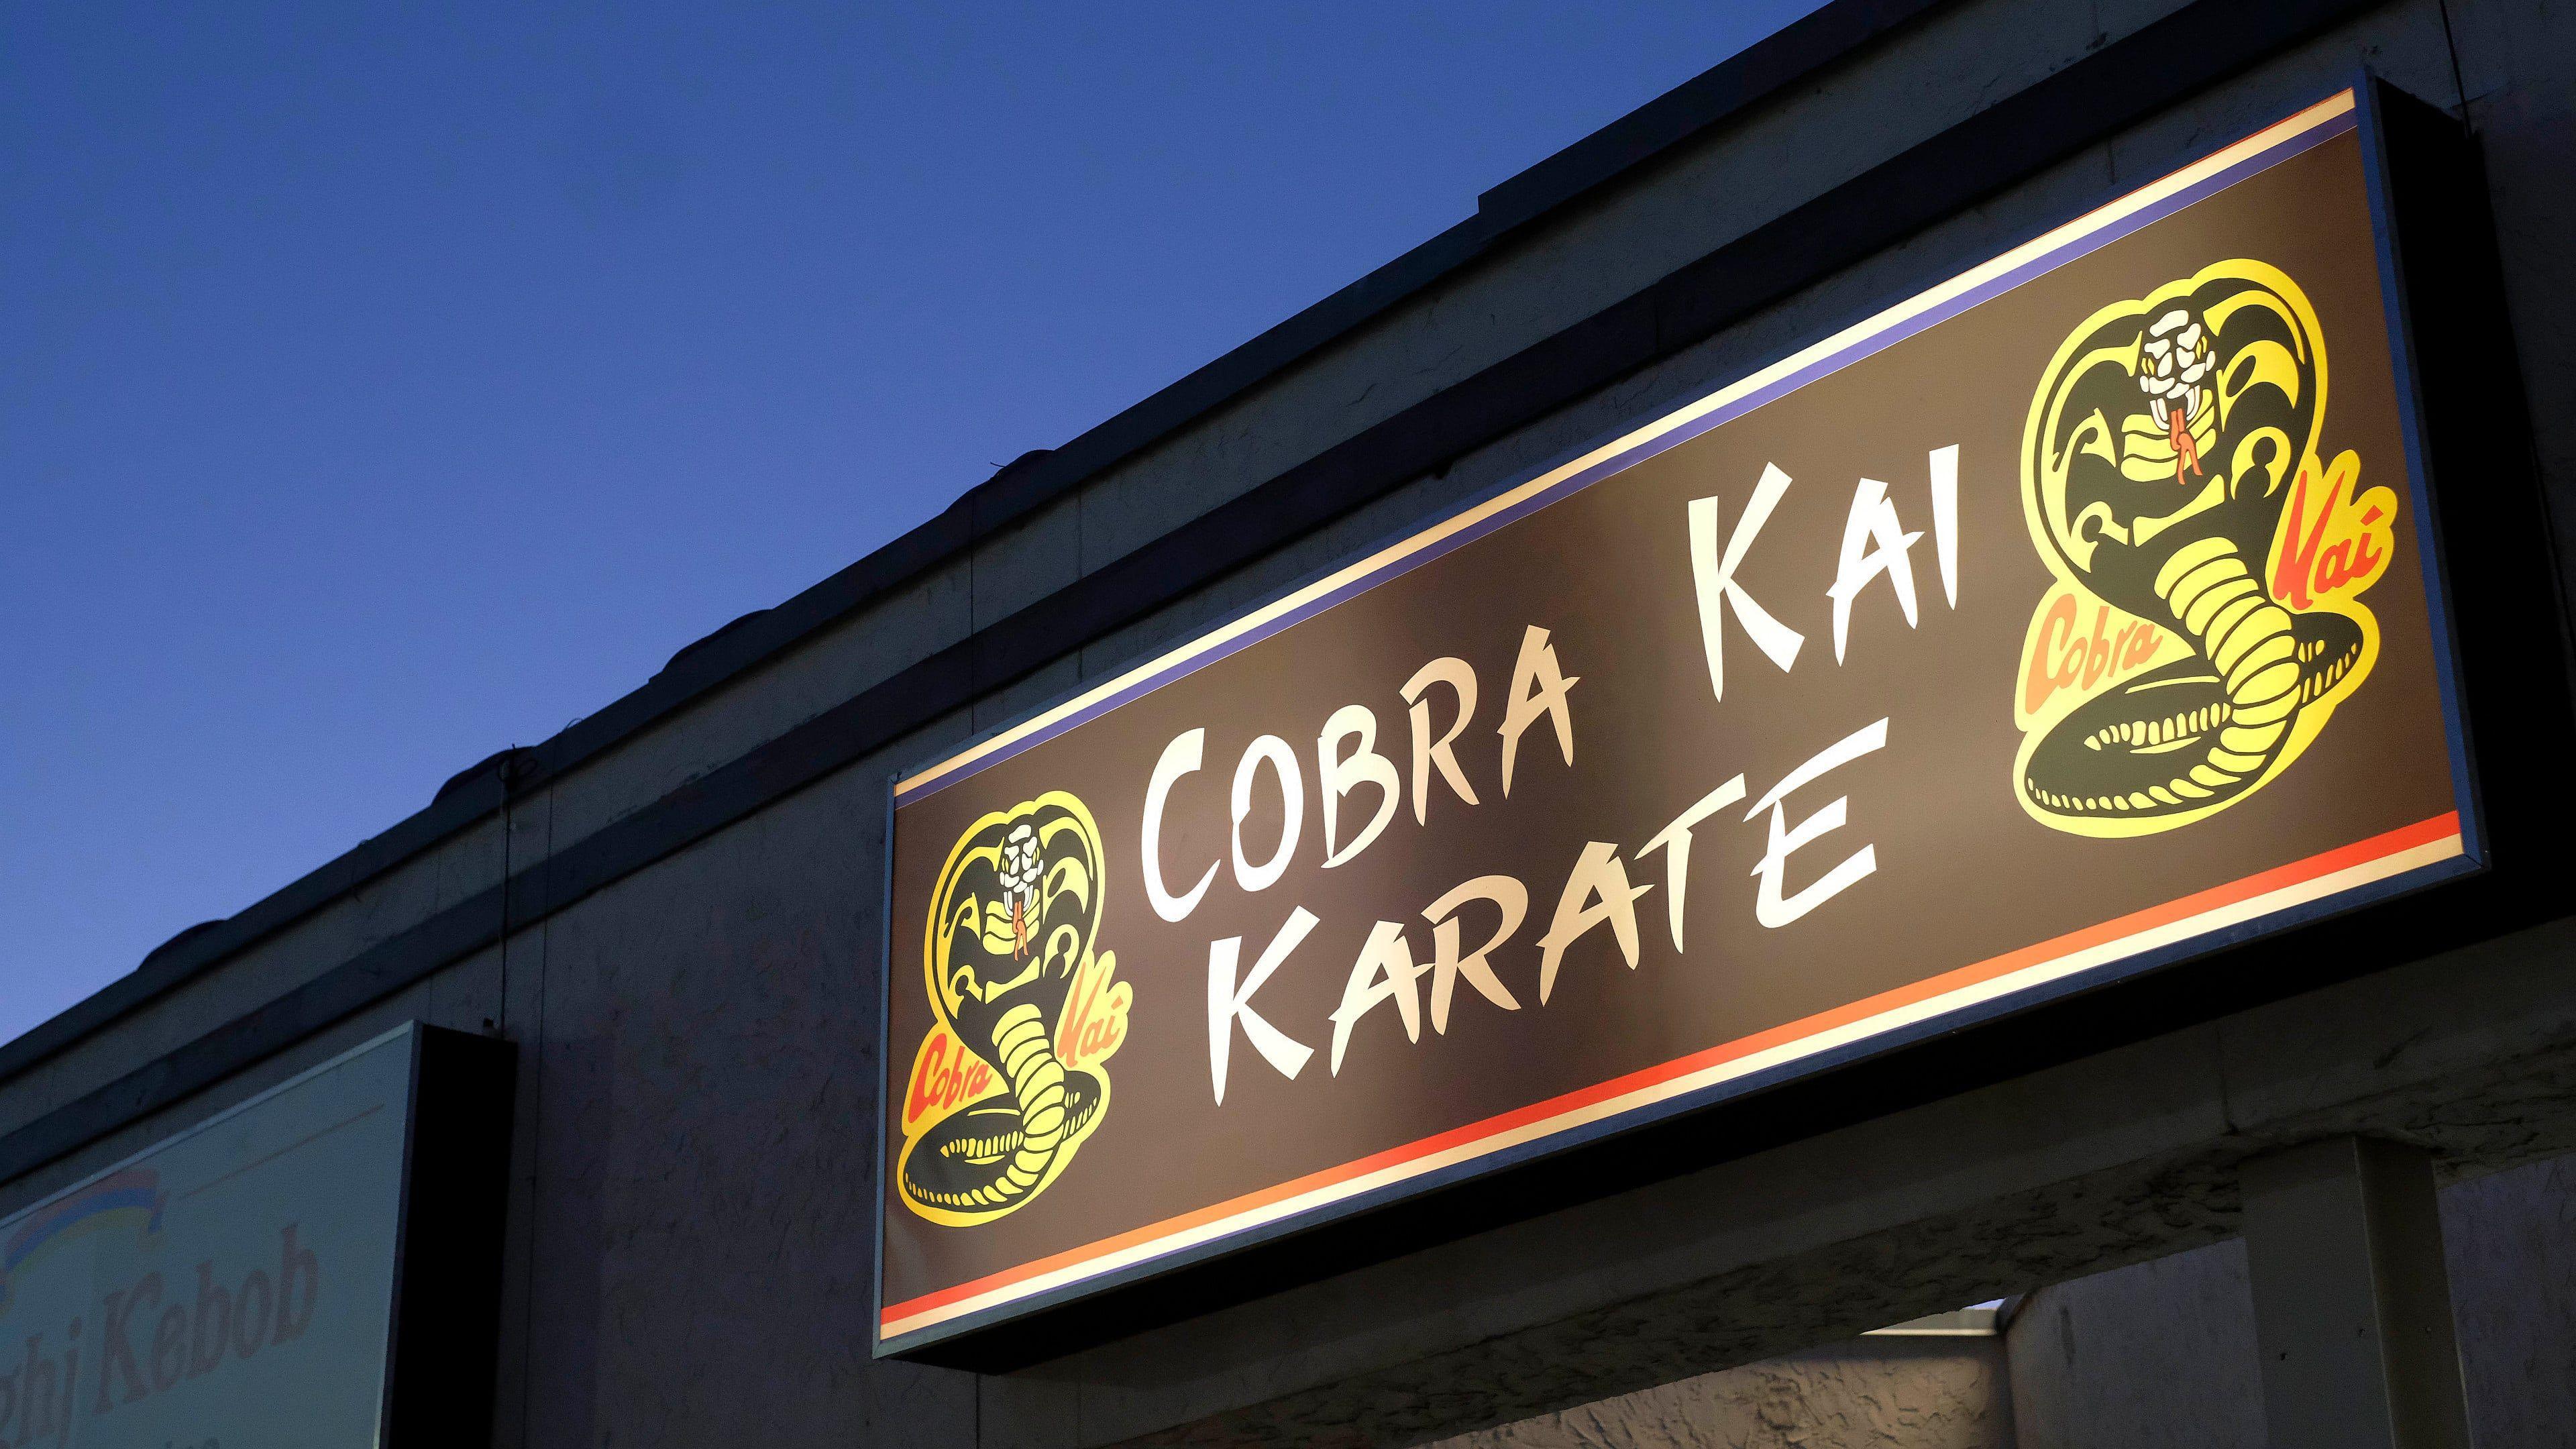 Cobra Kai Background 8